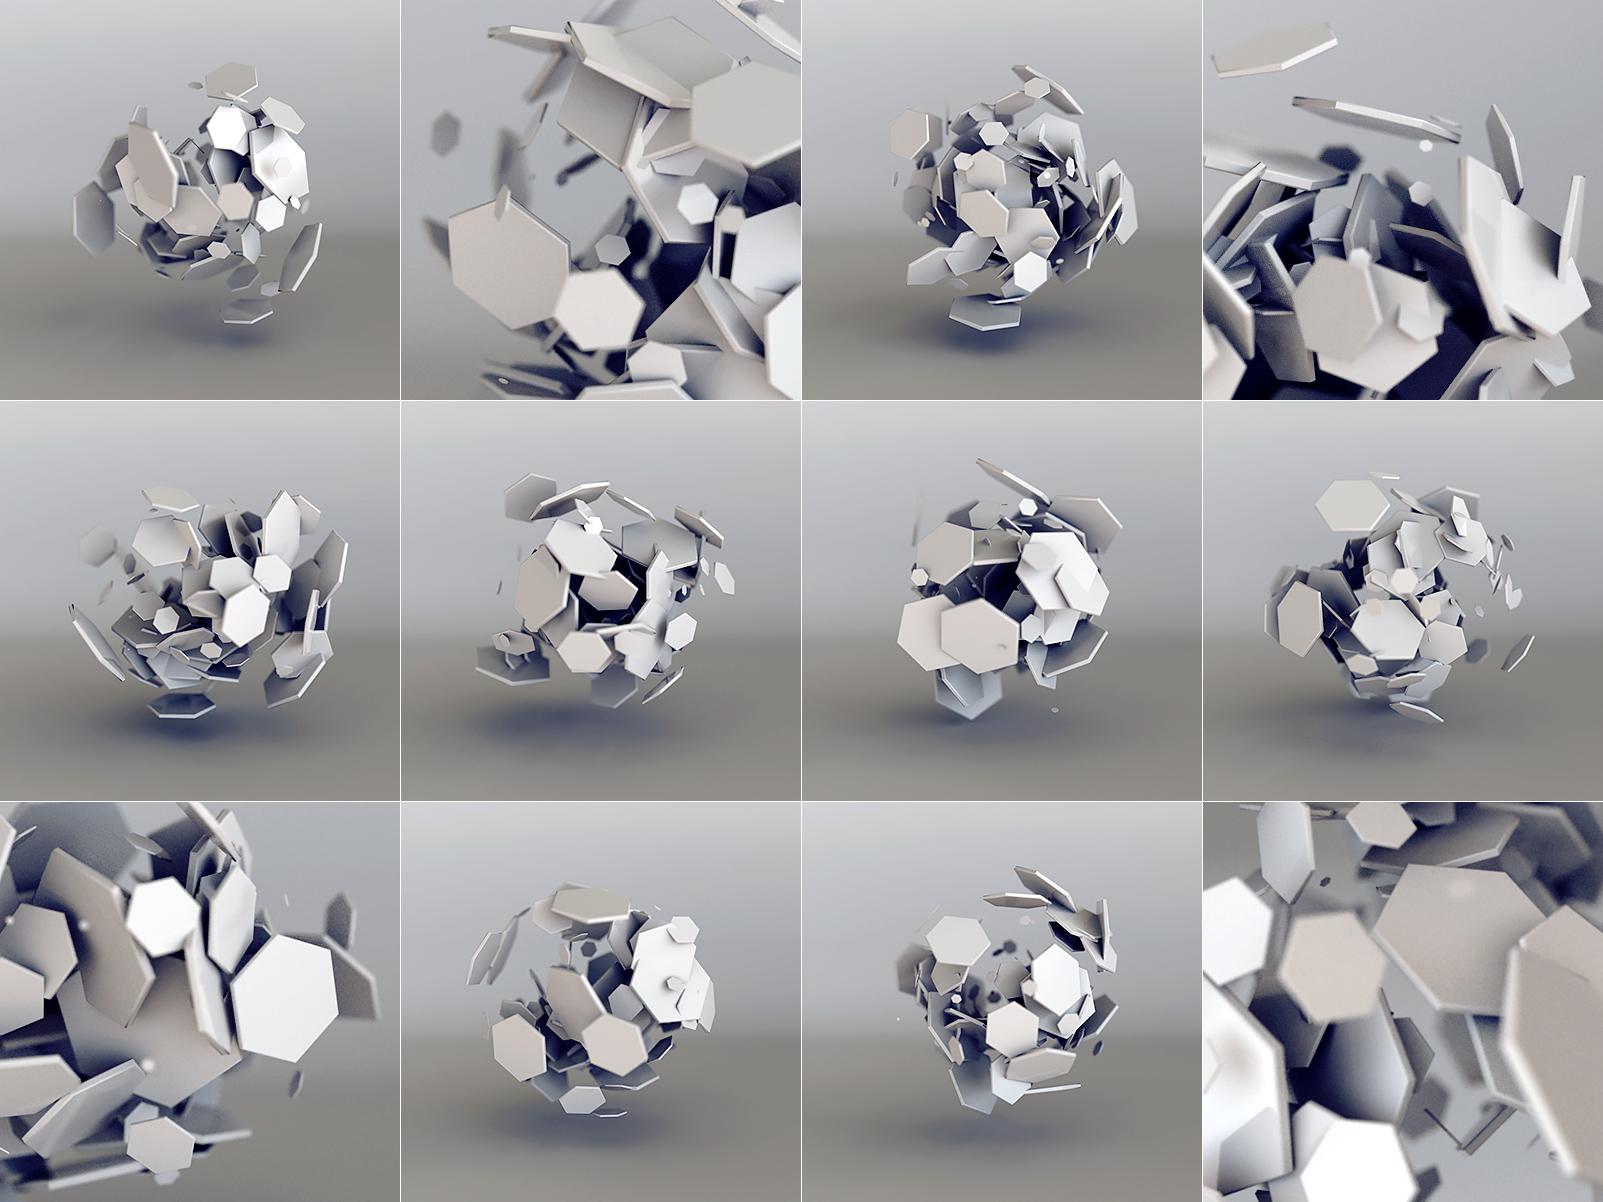 fragments_001.jpg